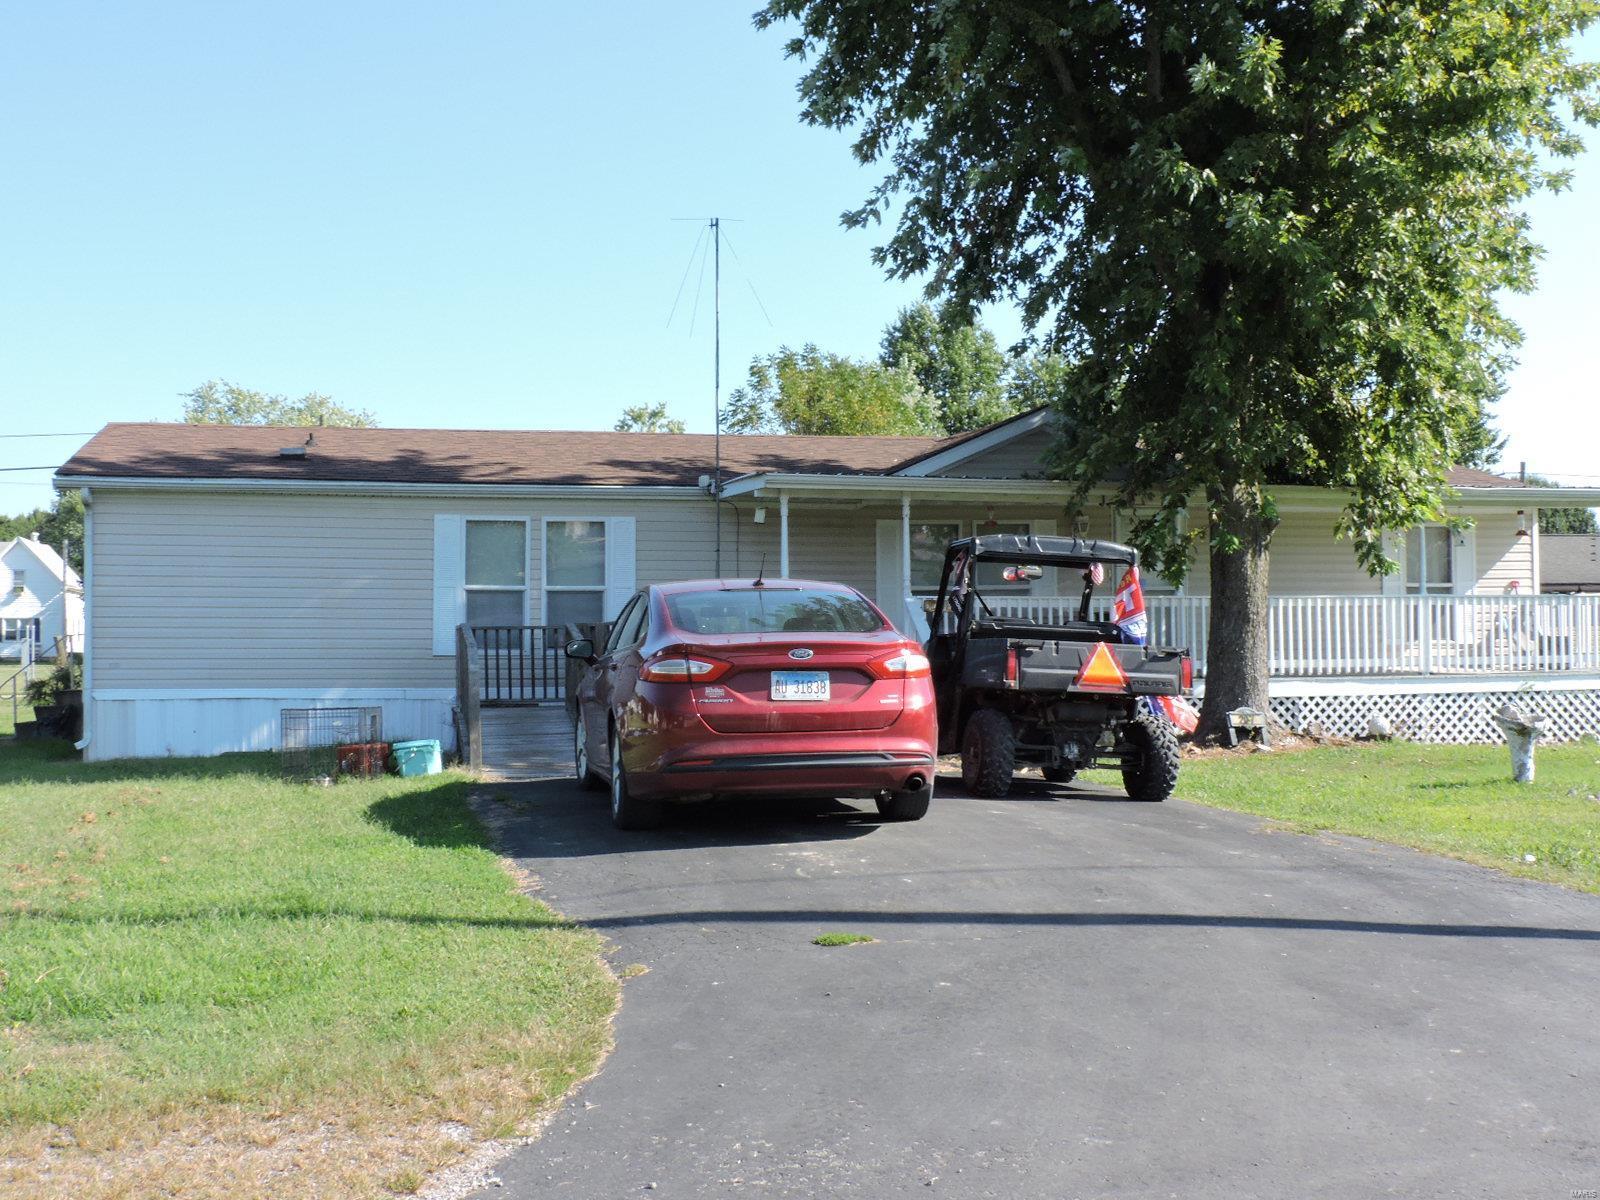 207 W Washington Property Photo - Ava, IL real estate listing